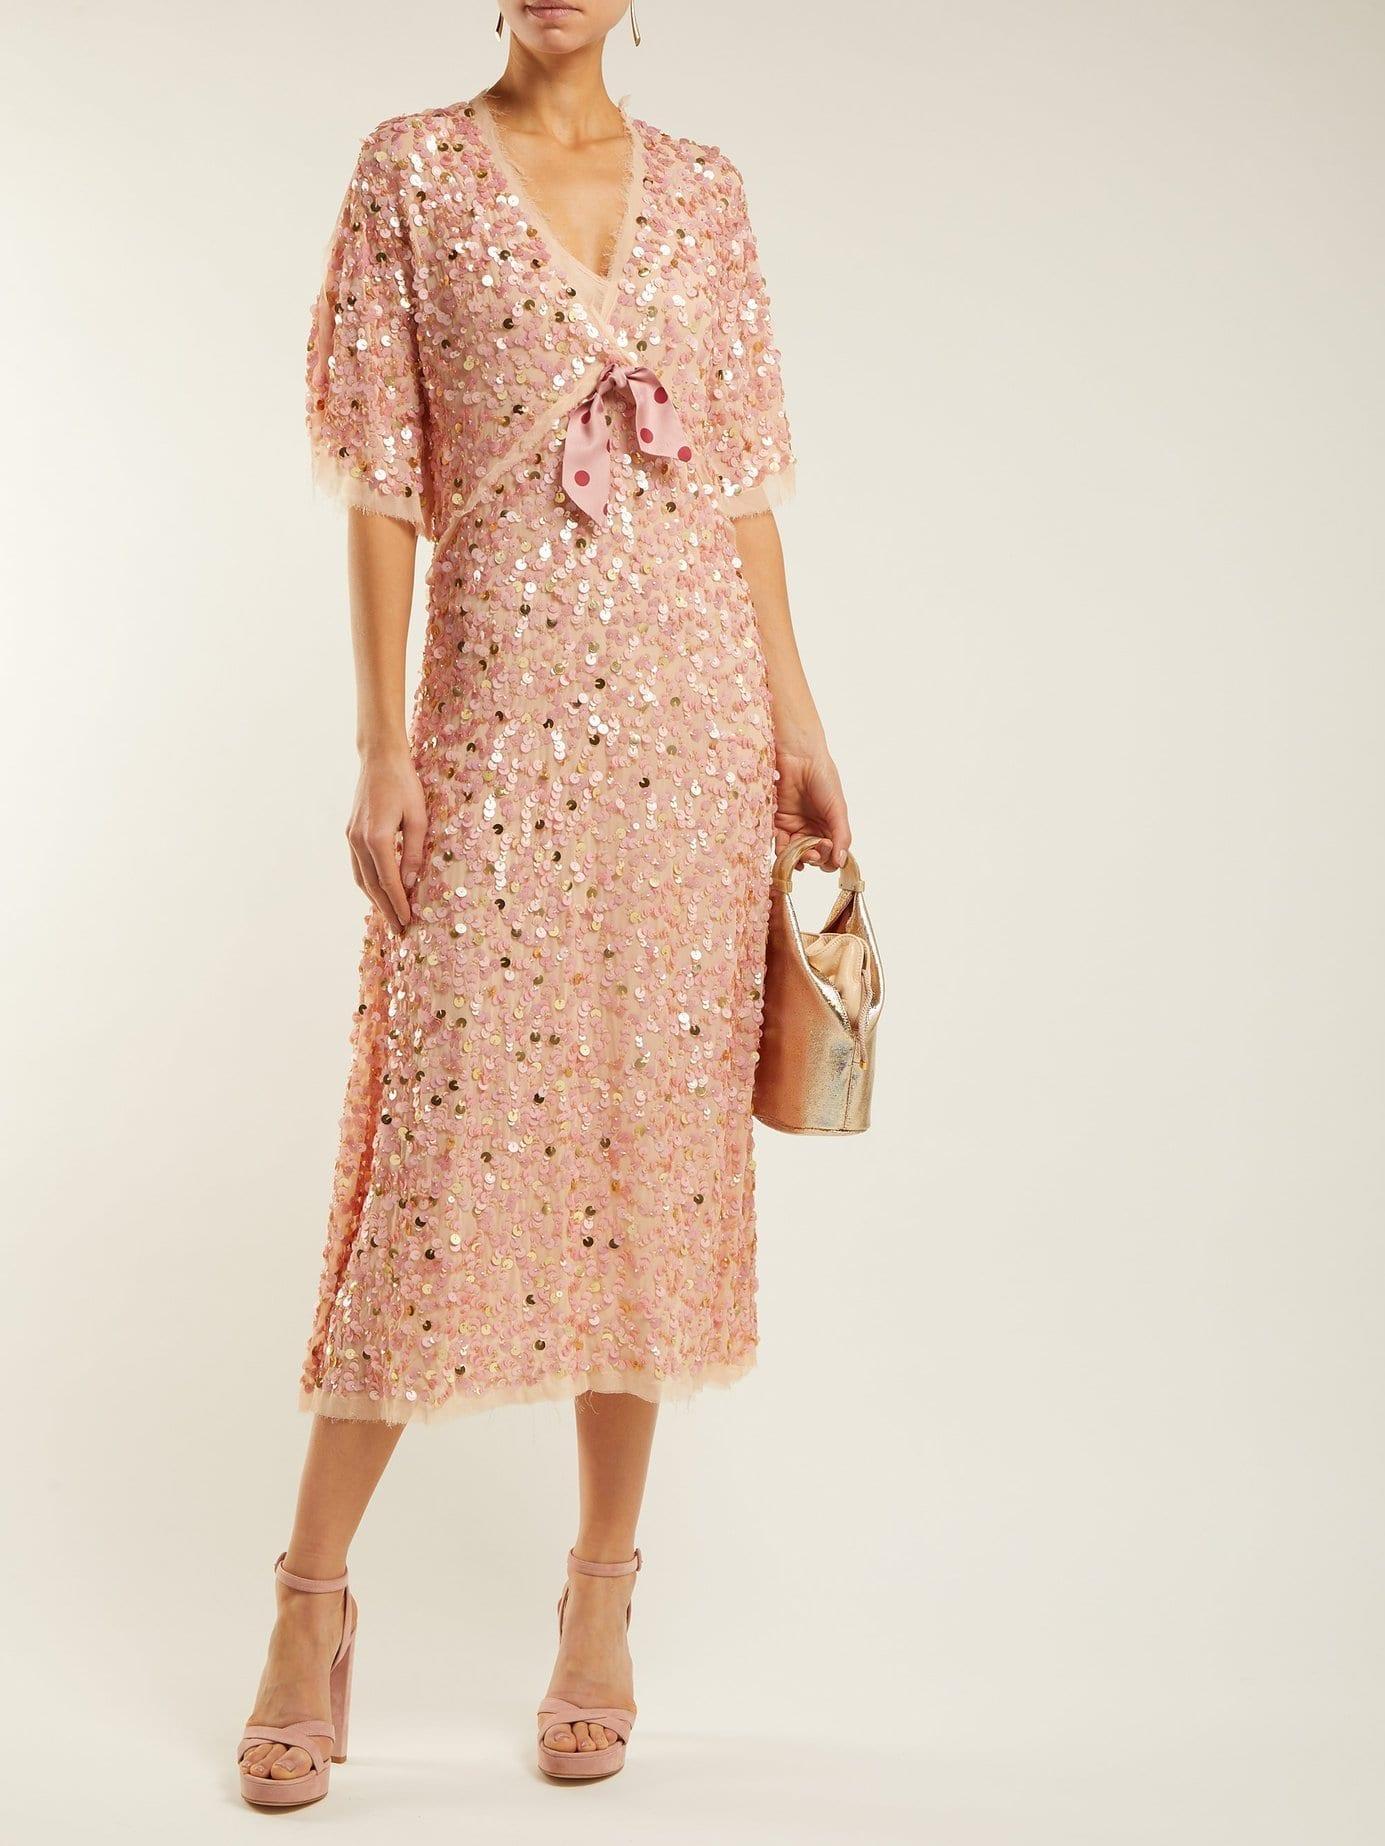 LUISA BECCARIA Bow Trim Sequinned Chiffon Pink Dress